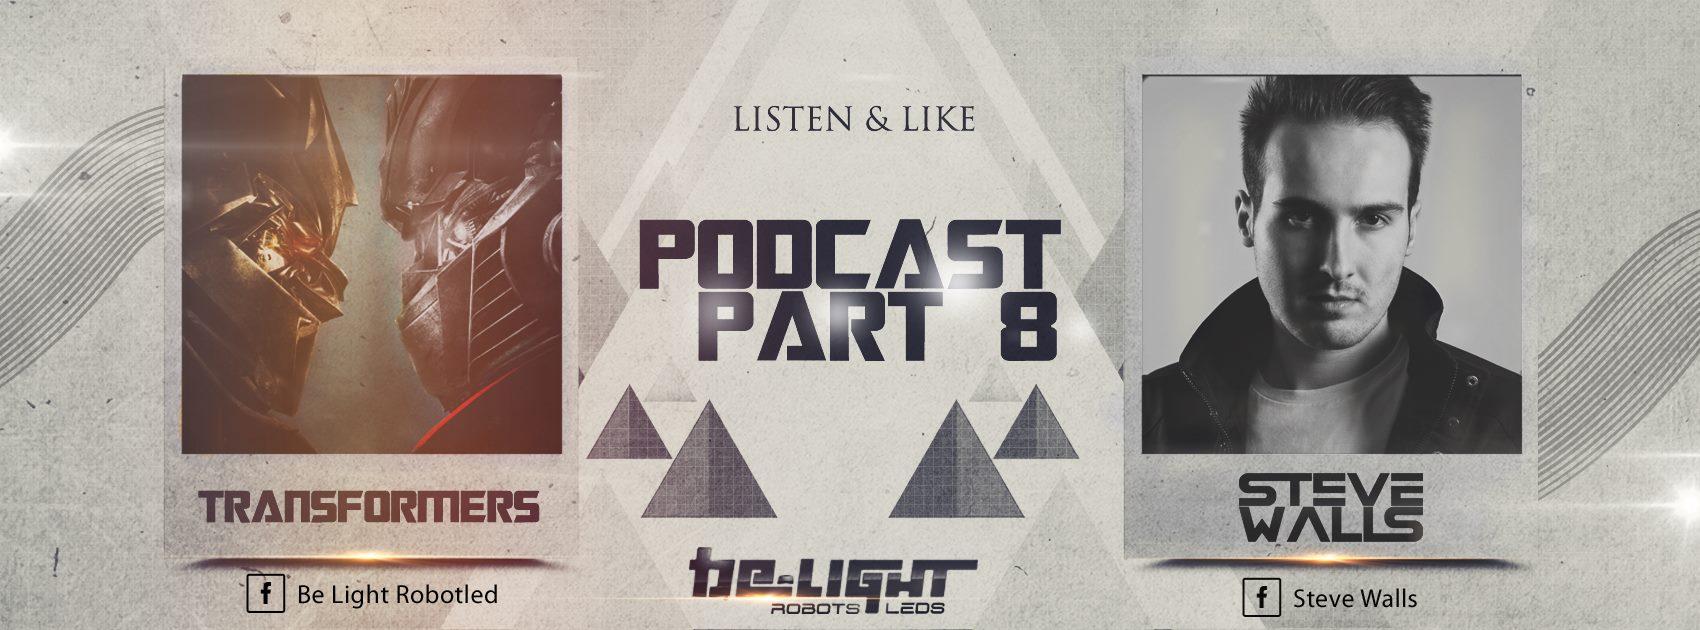 part 8 podcast